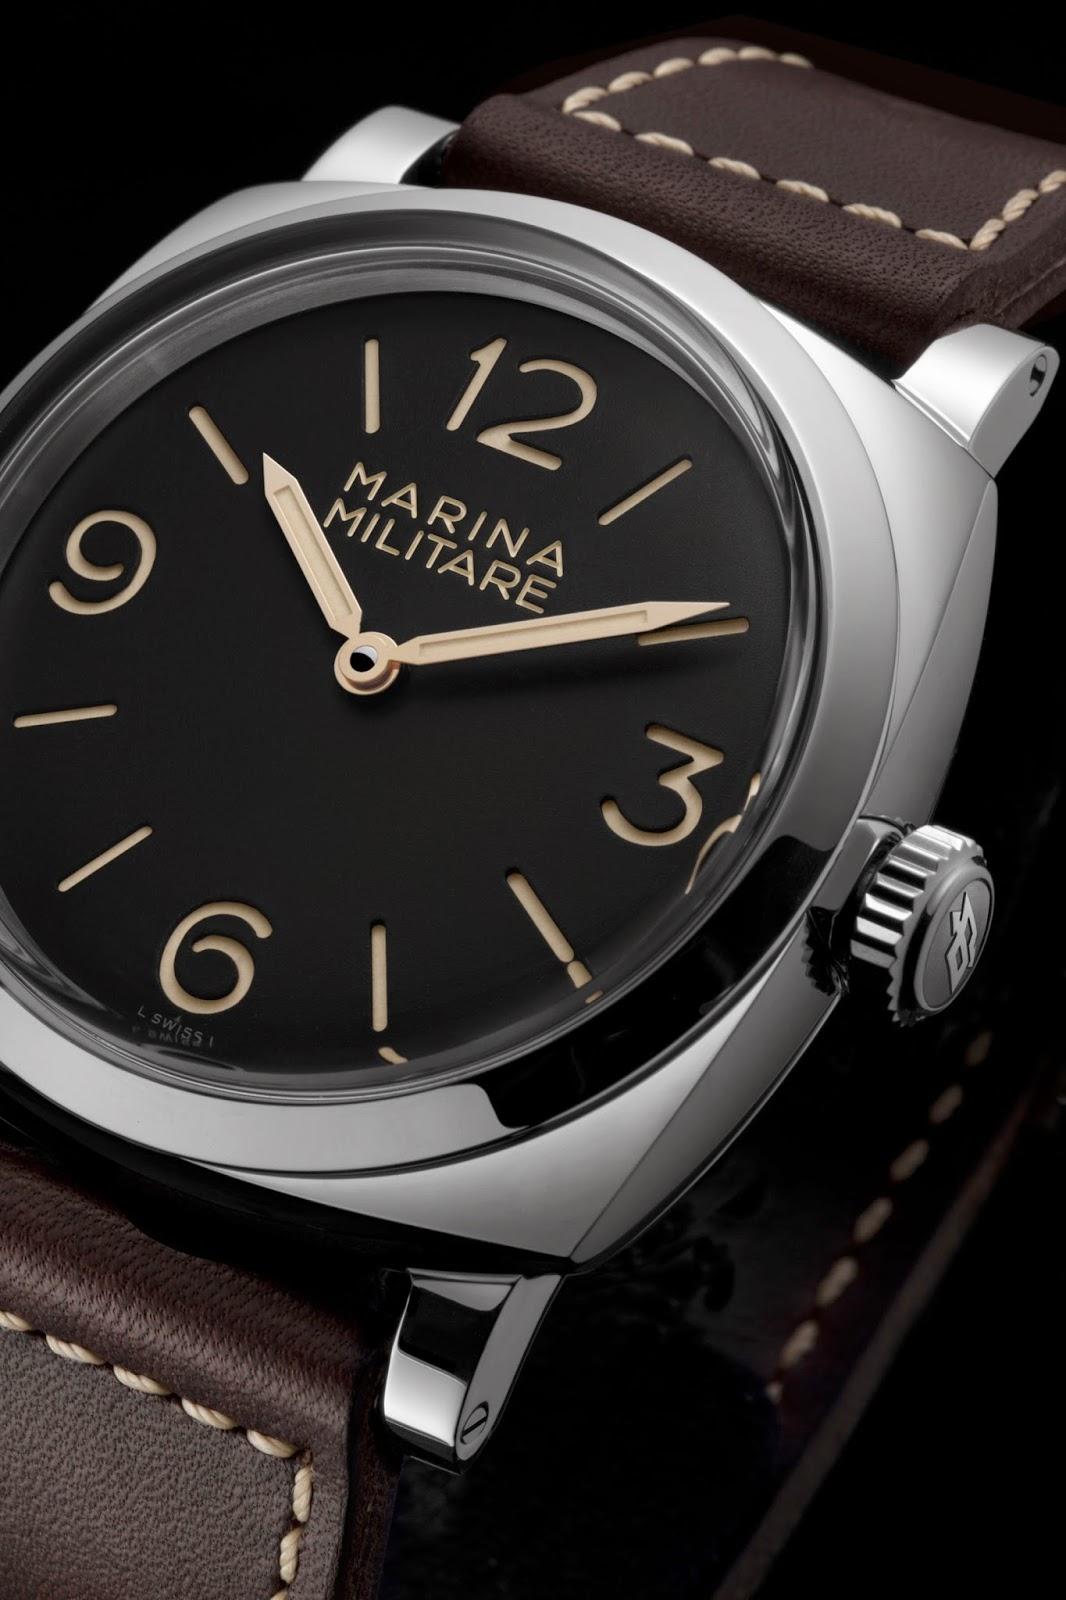 Panerai Radiomir 1940 Marina Militare 3 Days Acciaio – 47mm, Special Edition (PAM00587)